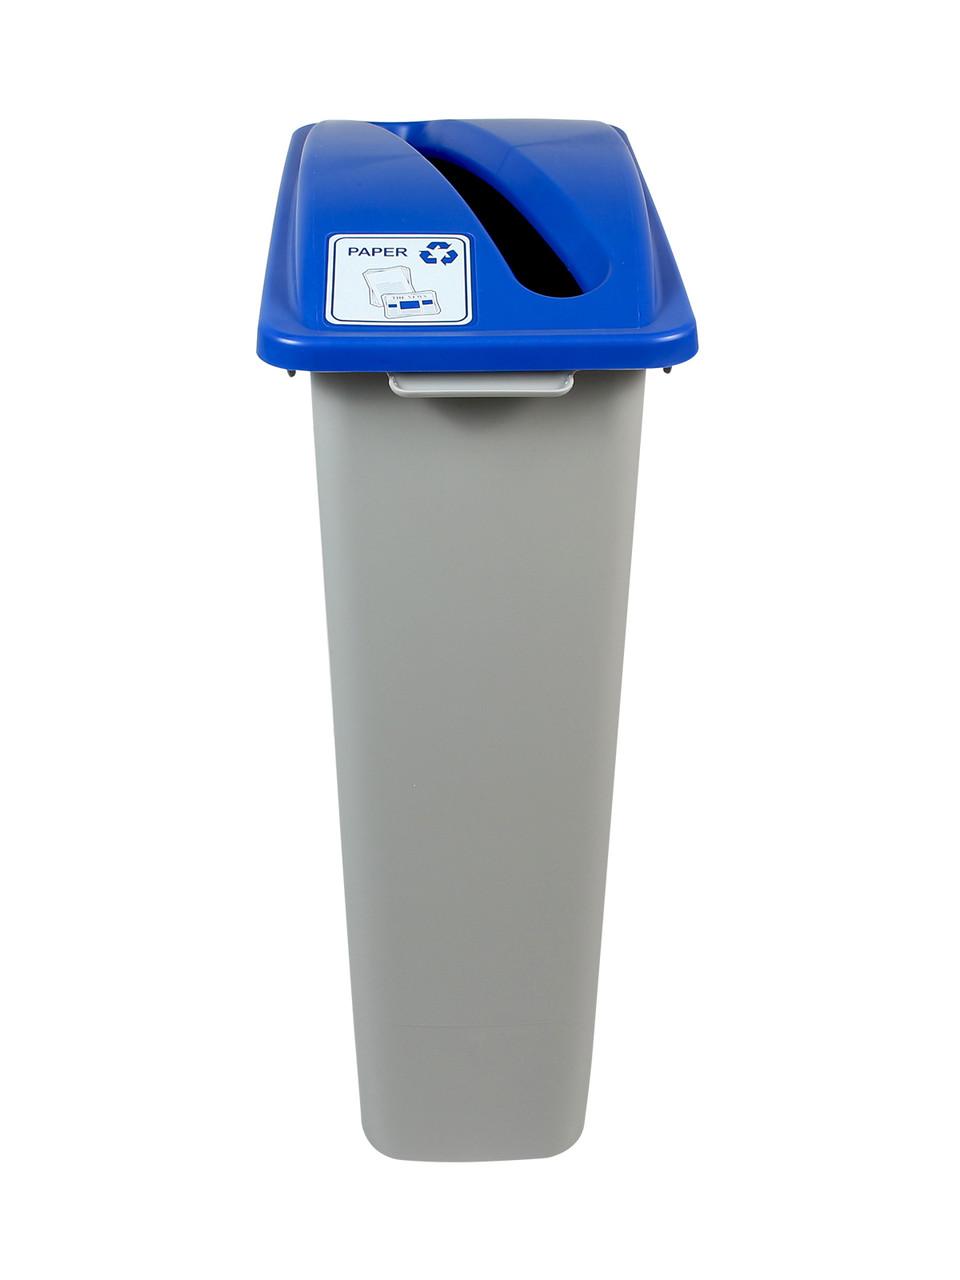 23 Gallon Skinny Simple Sort Recycle Bin Blue Lid